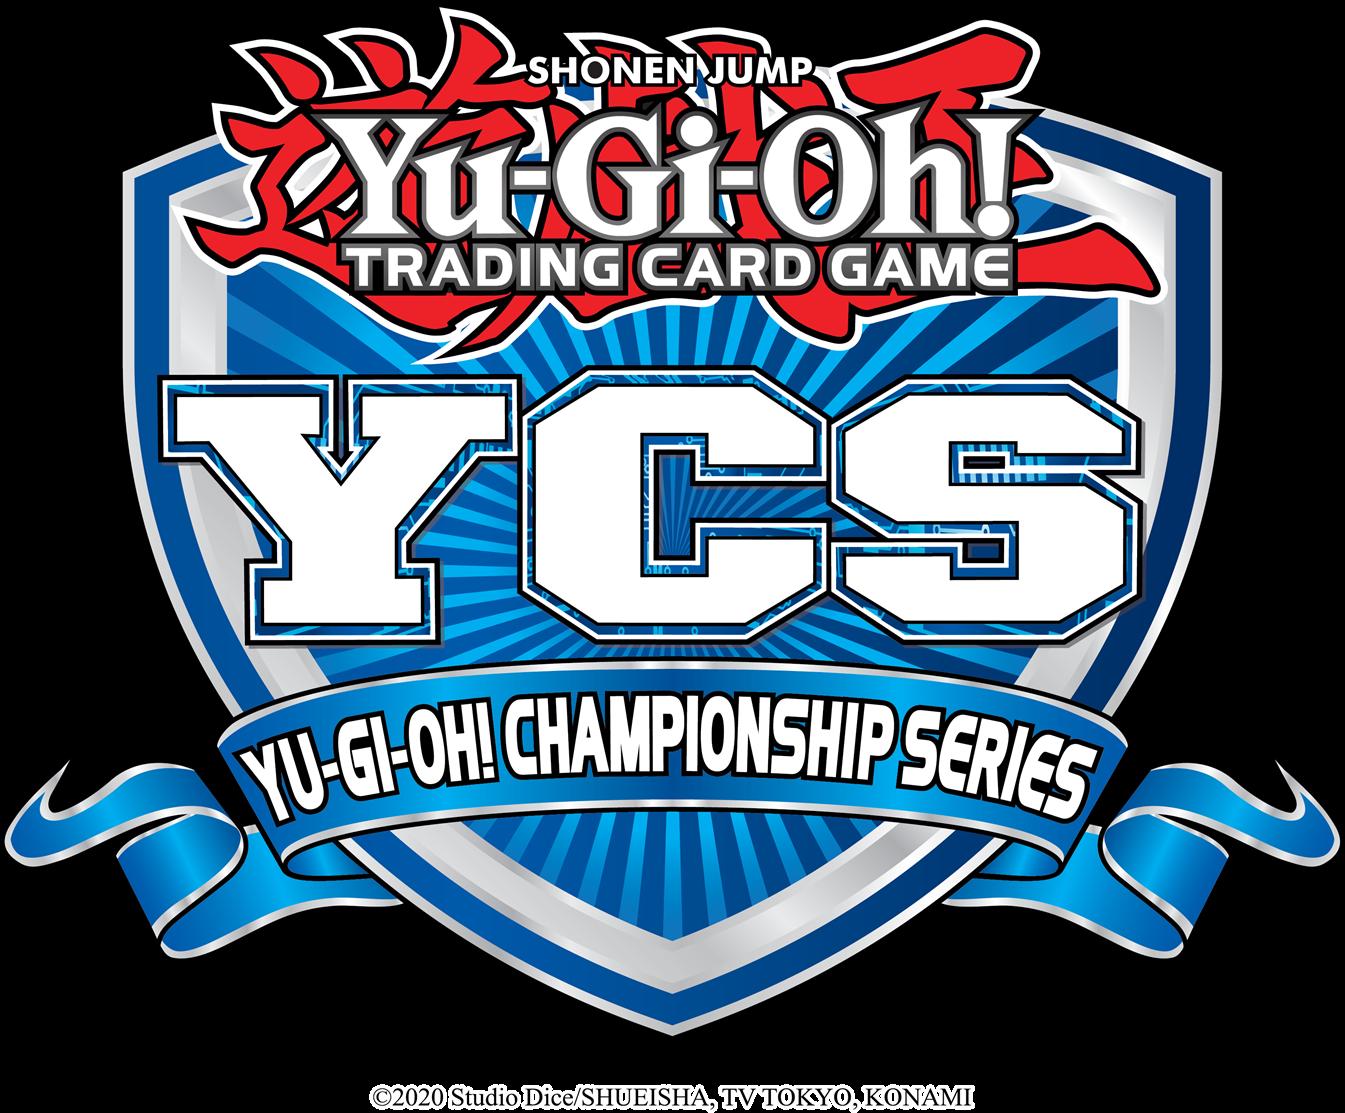 Yu-Gi-Oh! Championship Series torna in presenza